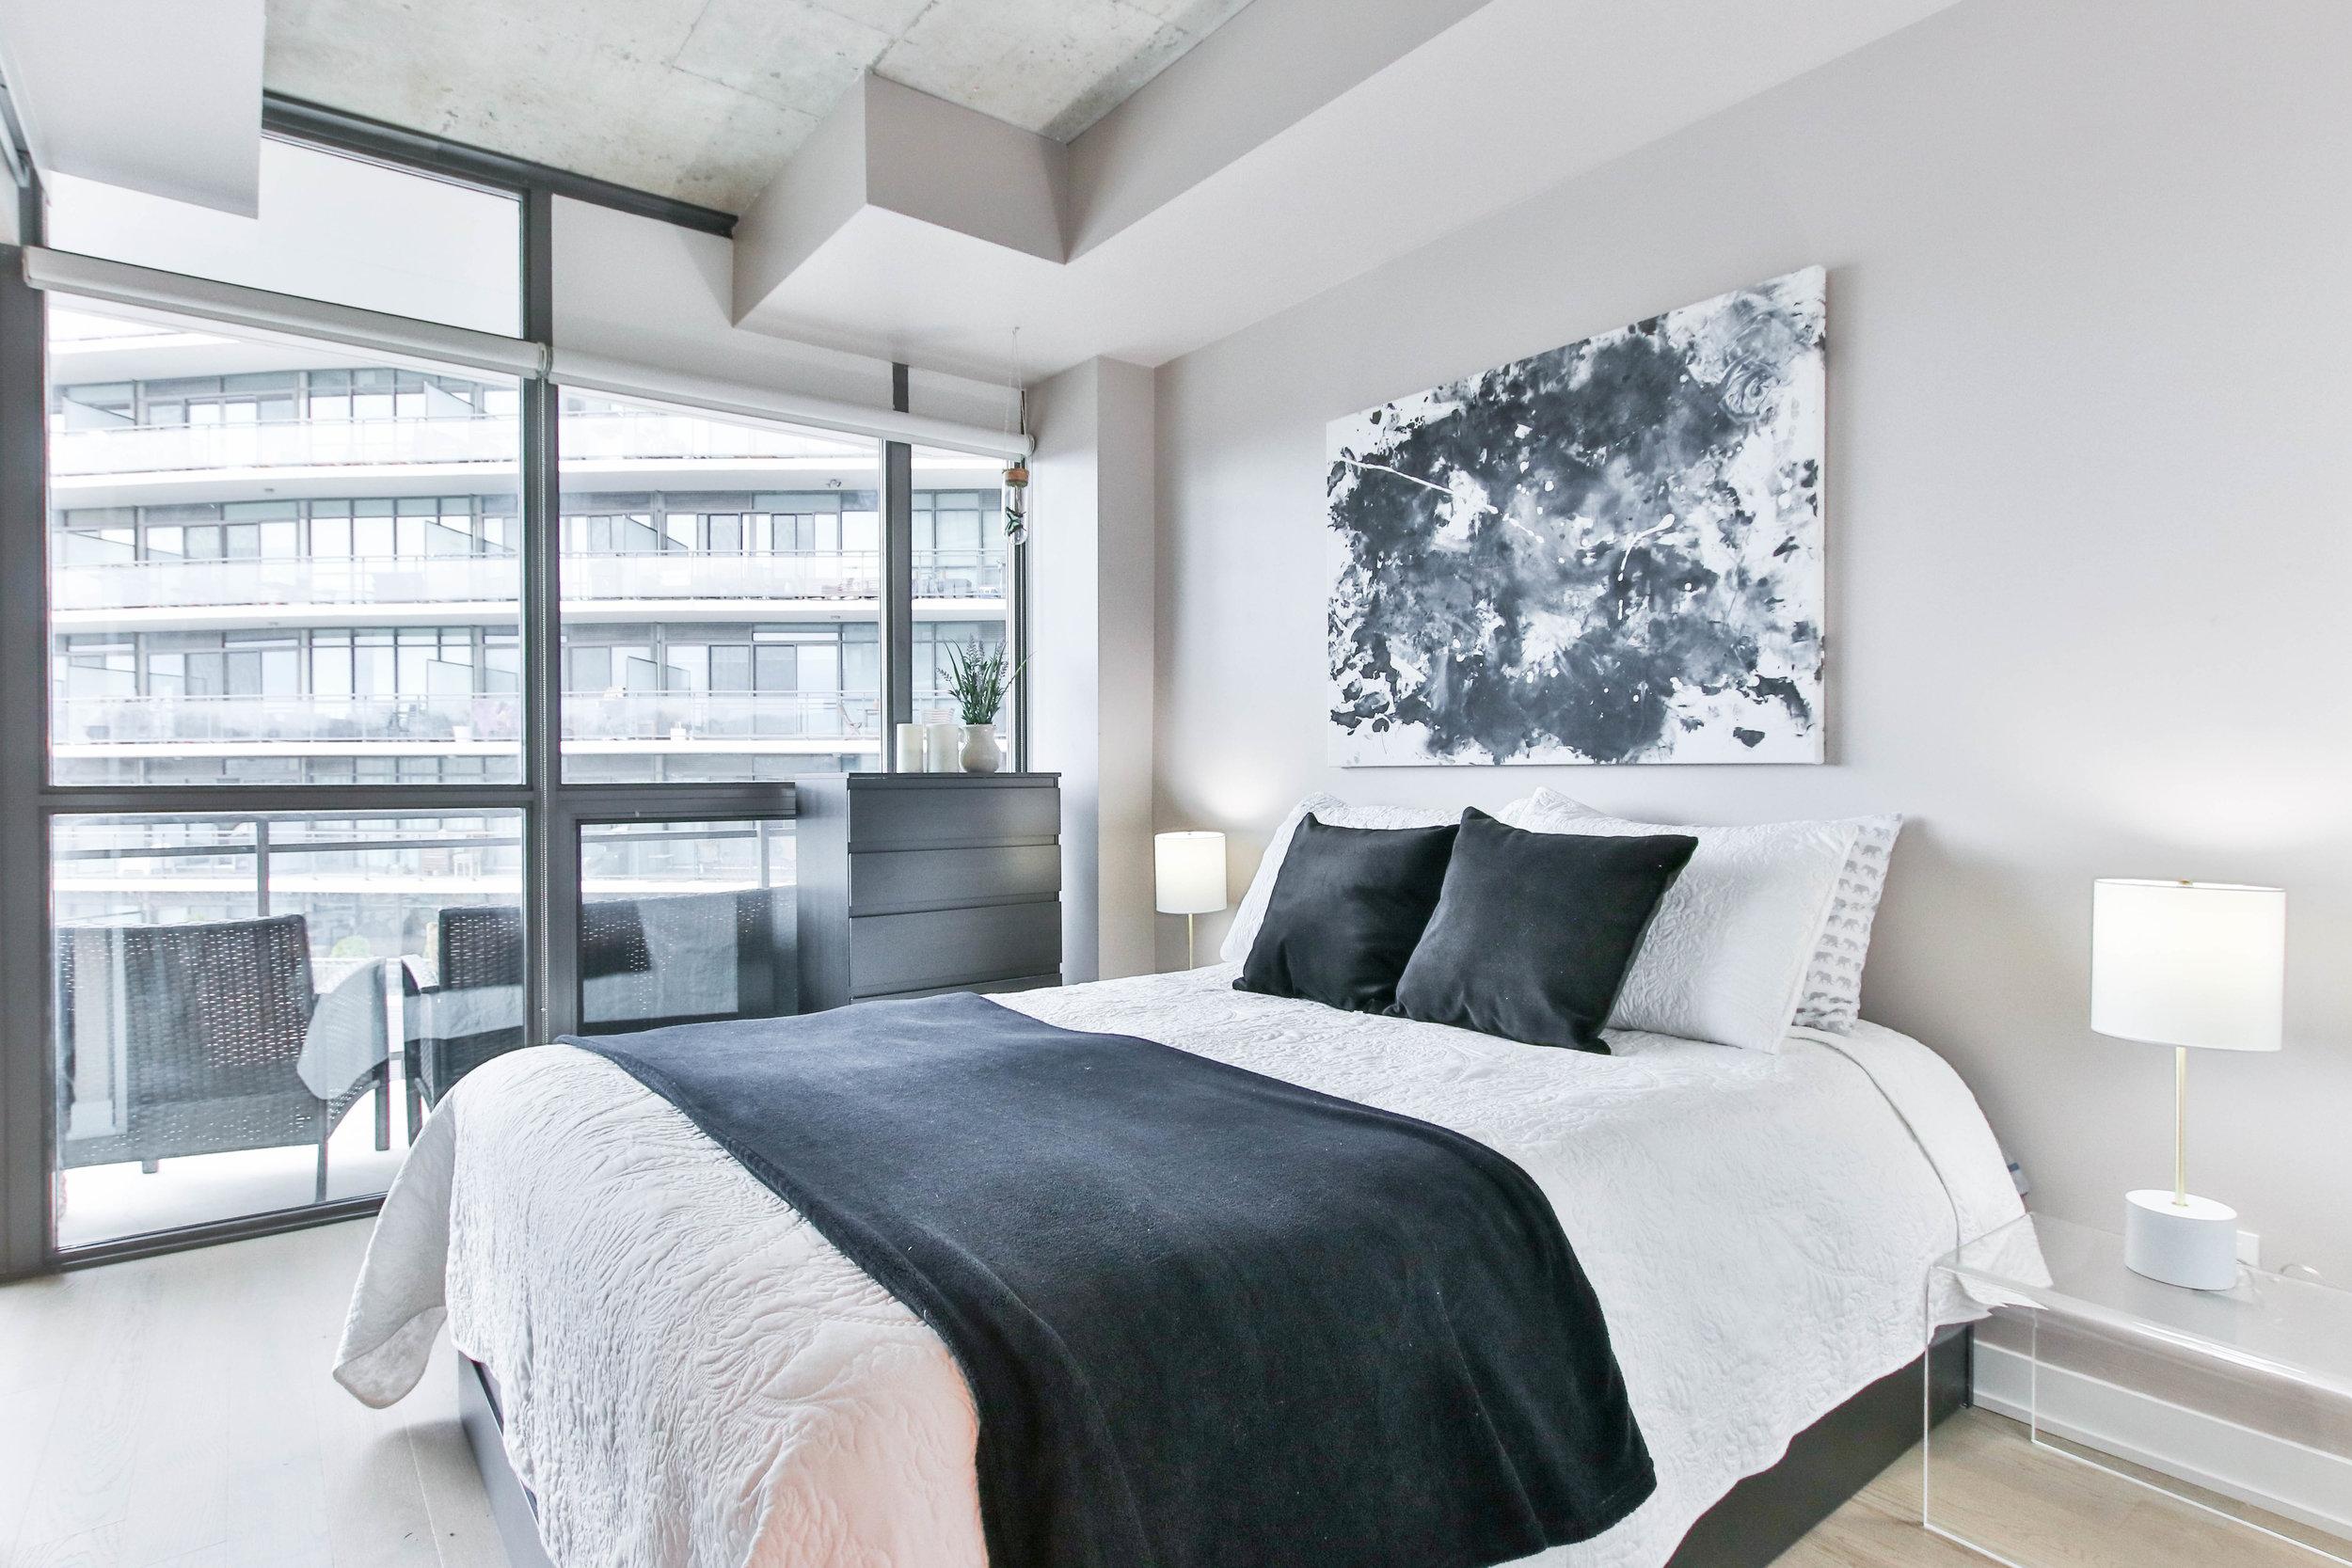 19_Bedroom.jpg